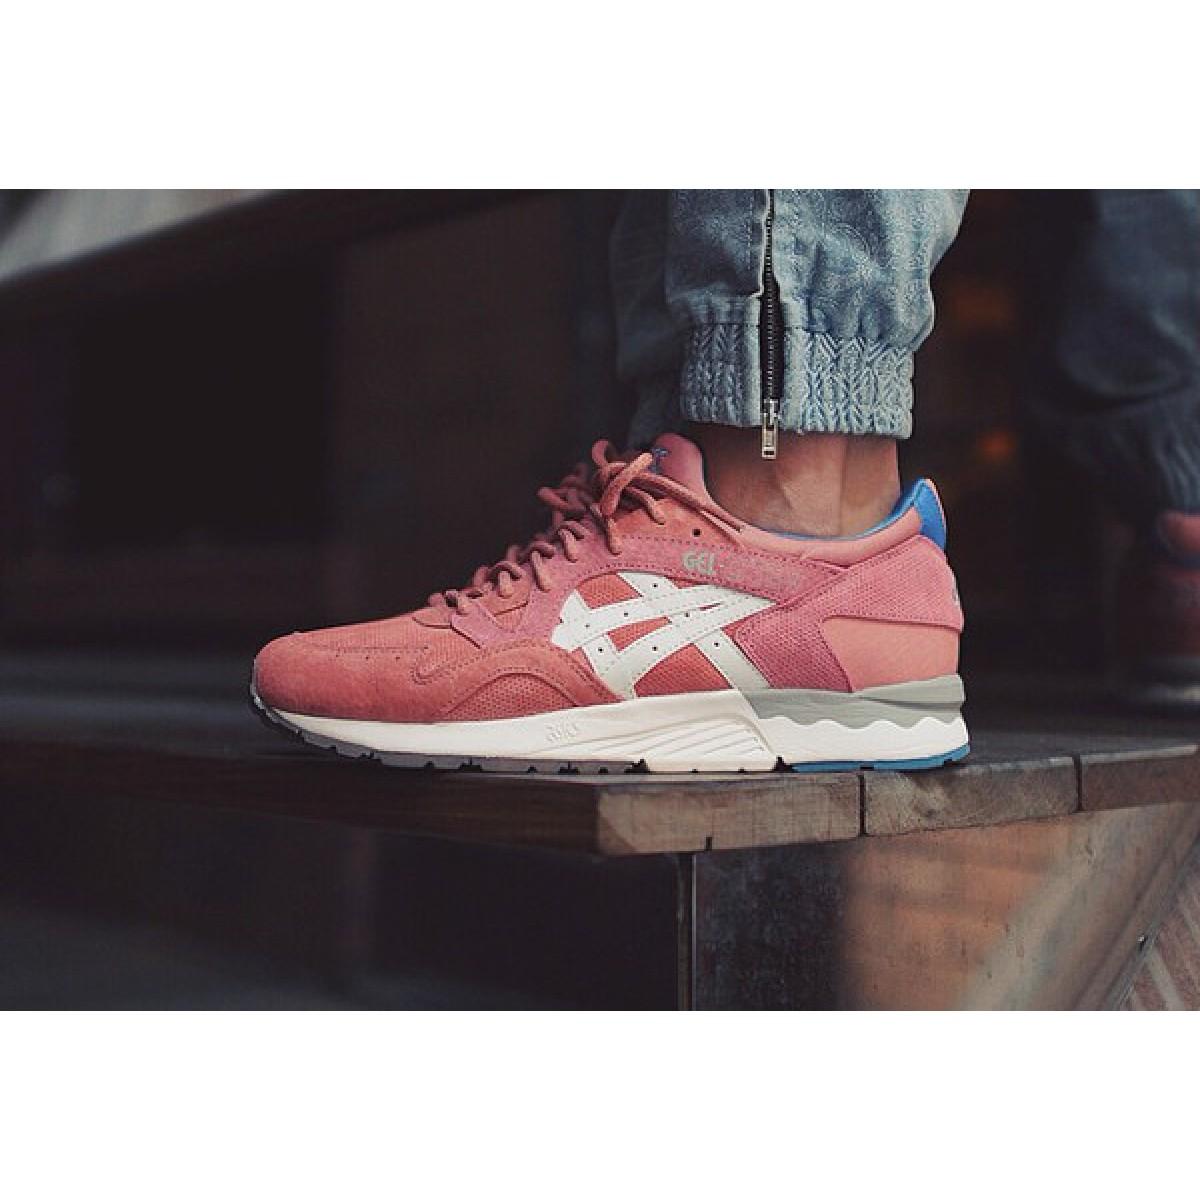 chaussure asics gel lyte femme rose